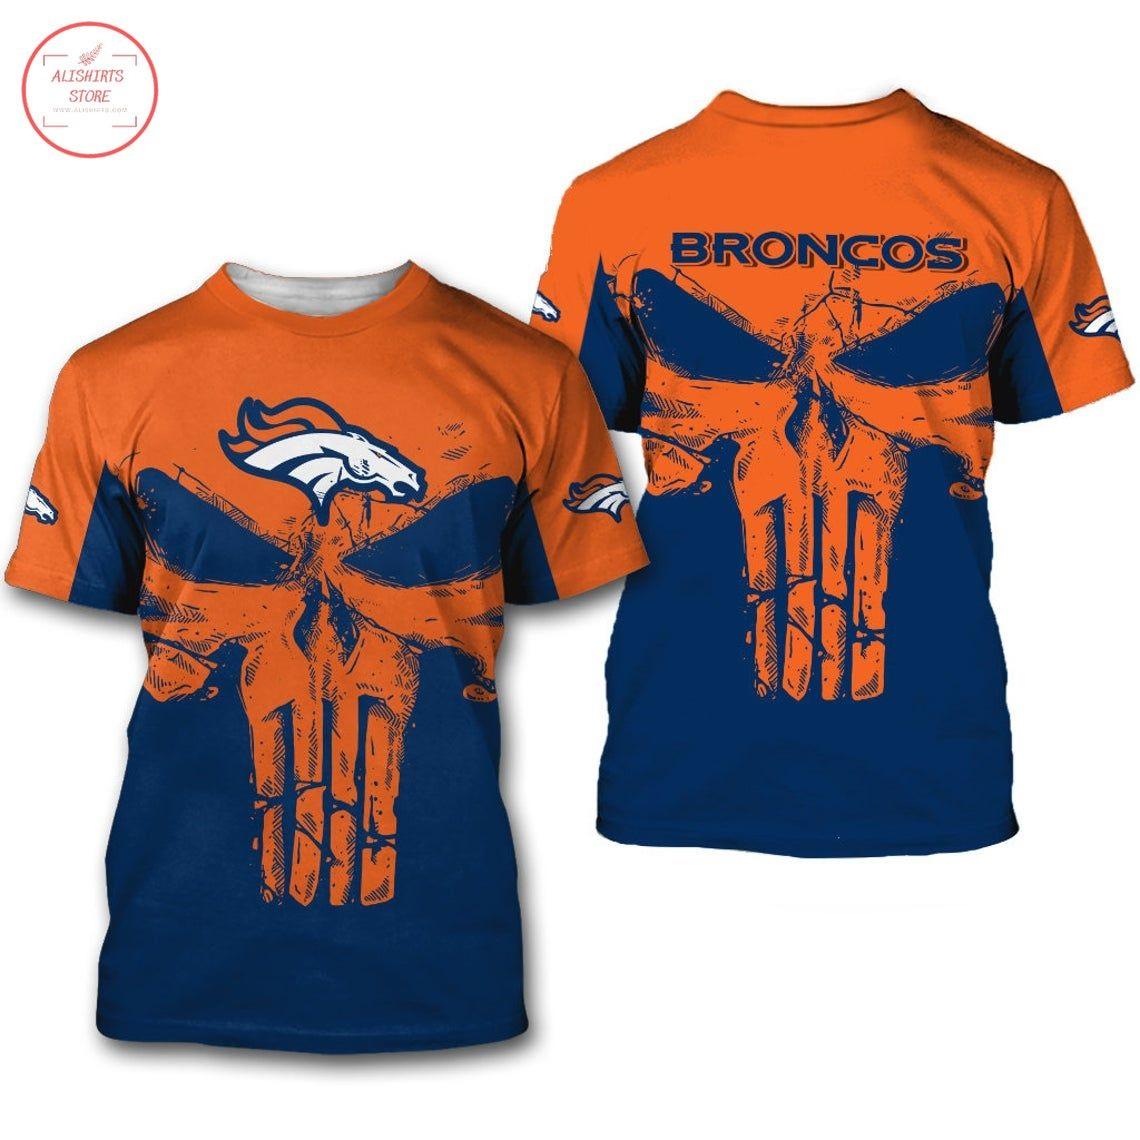 Denver Broncos Punisher Skull Shirt